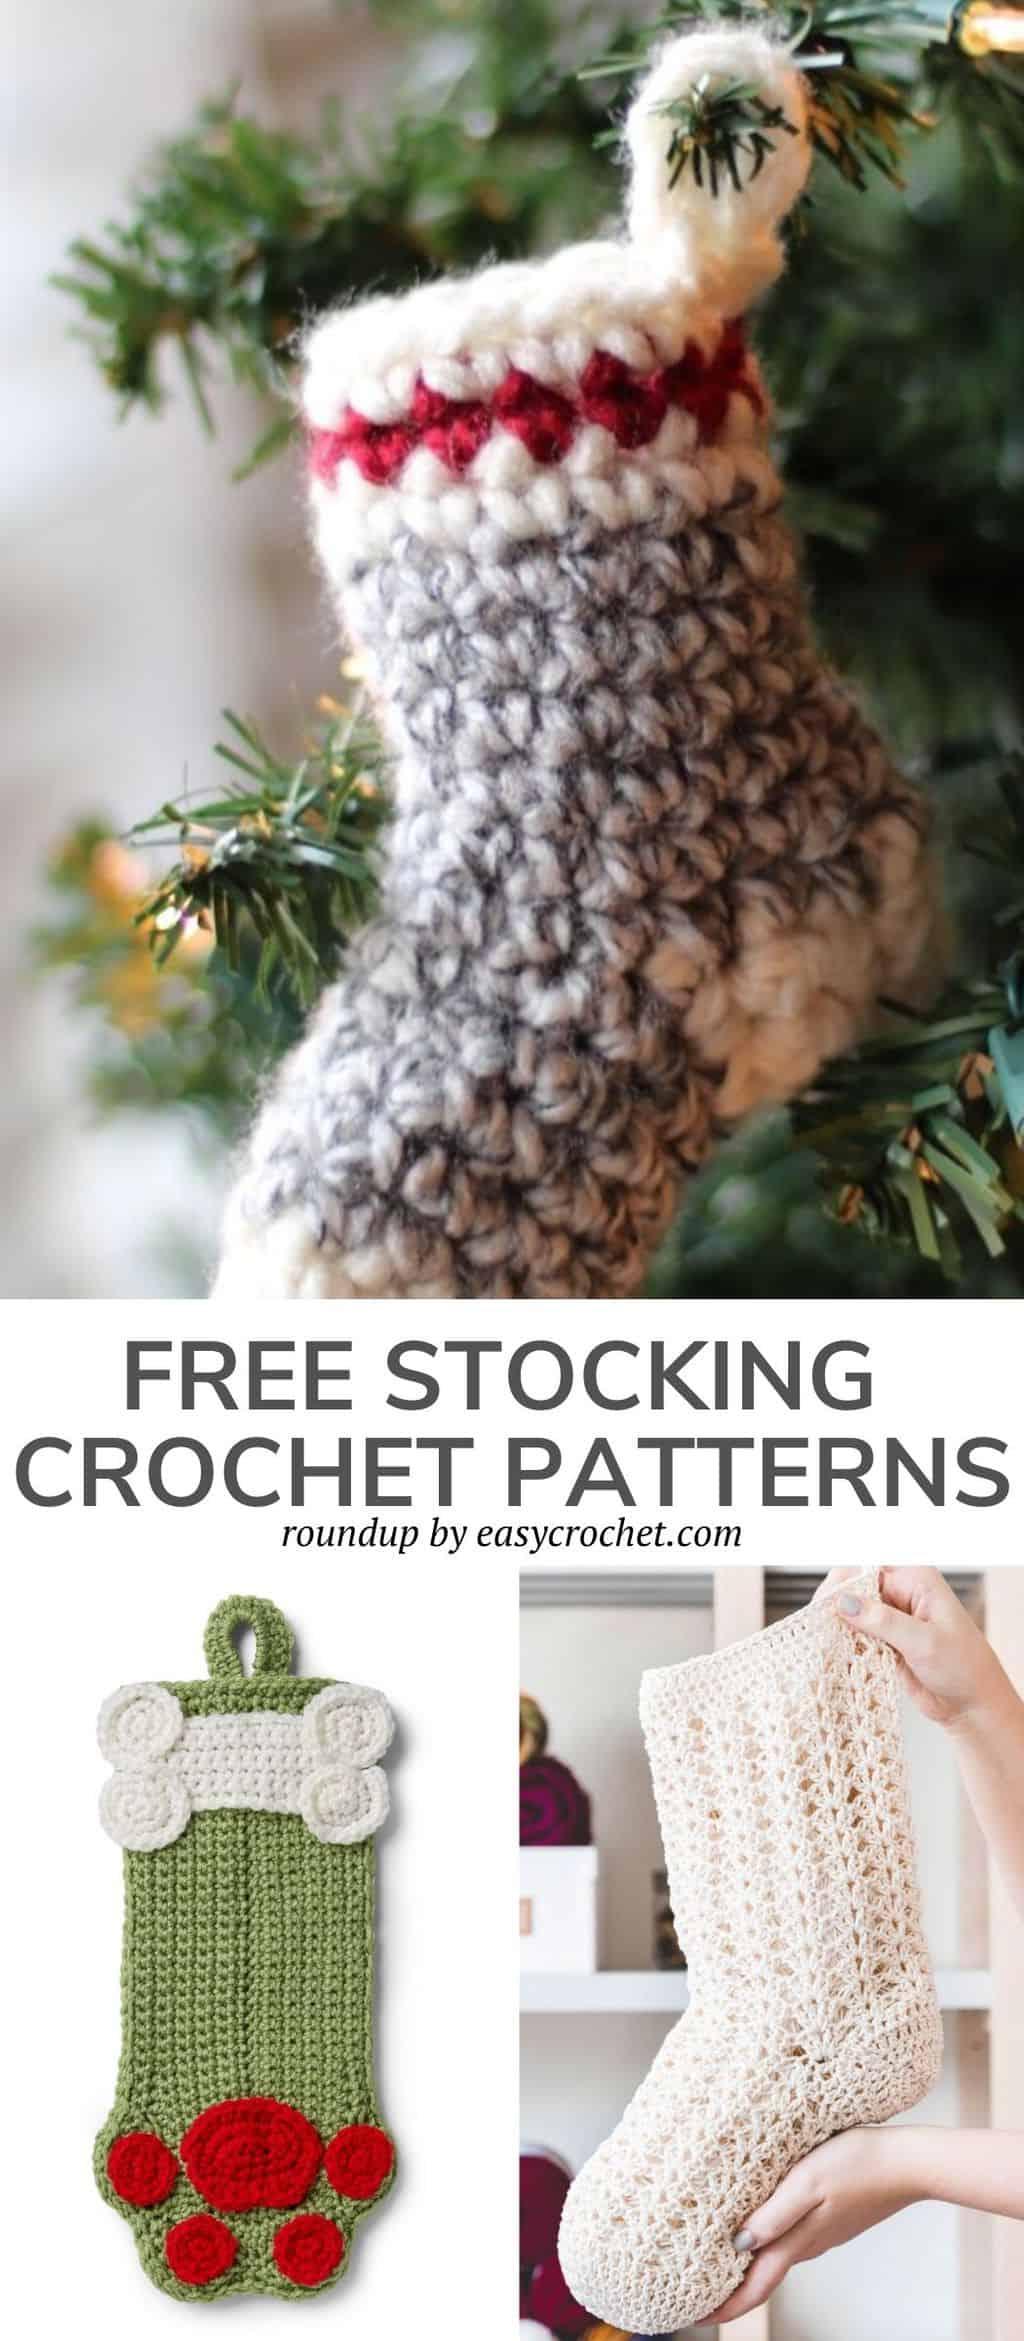 easy crochet Christmas stocking patterns